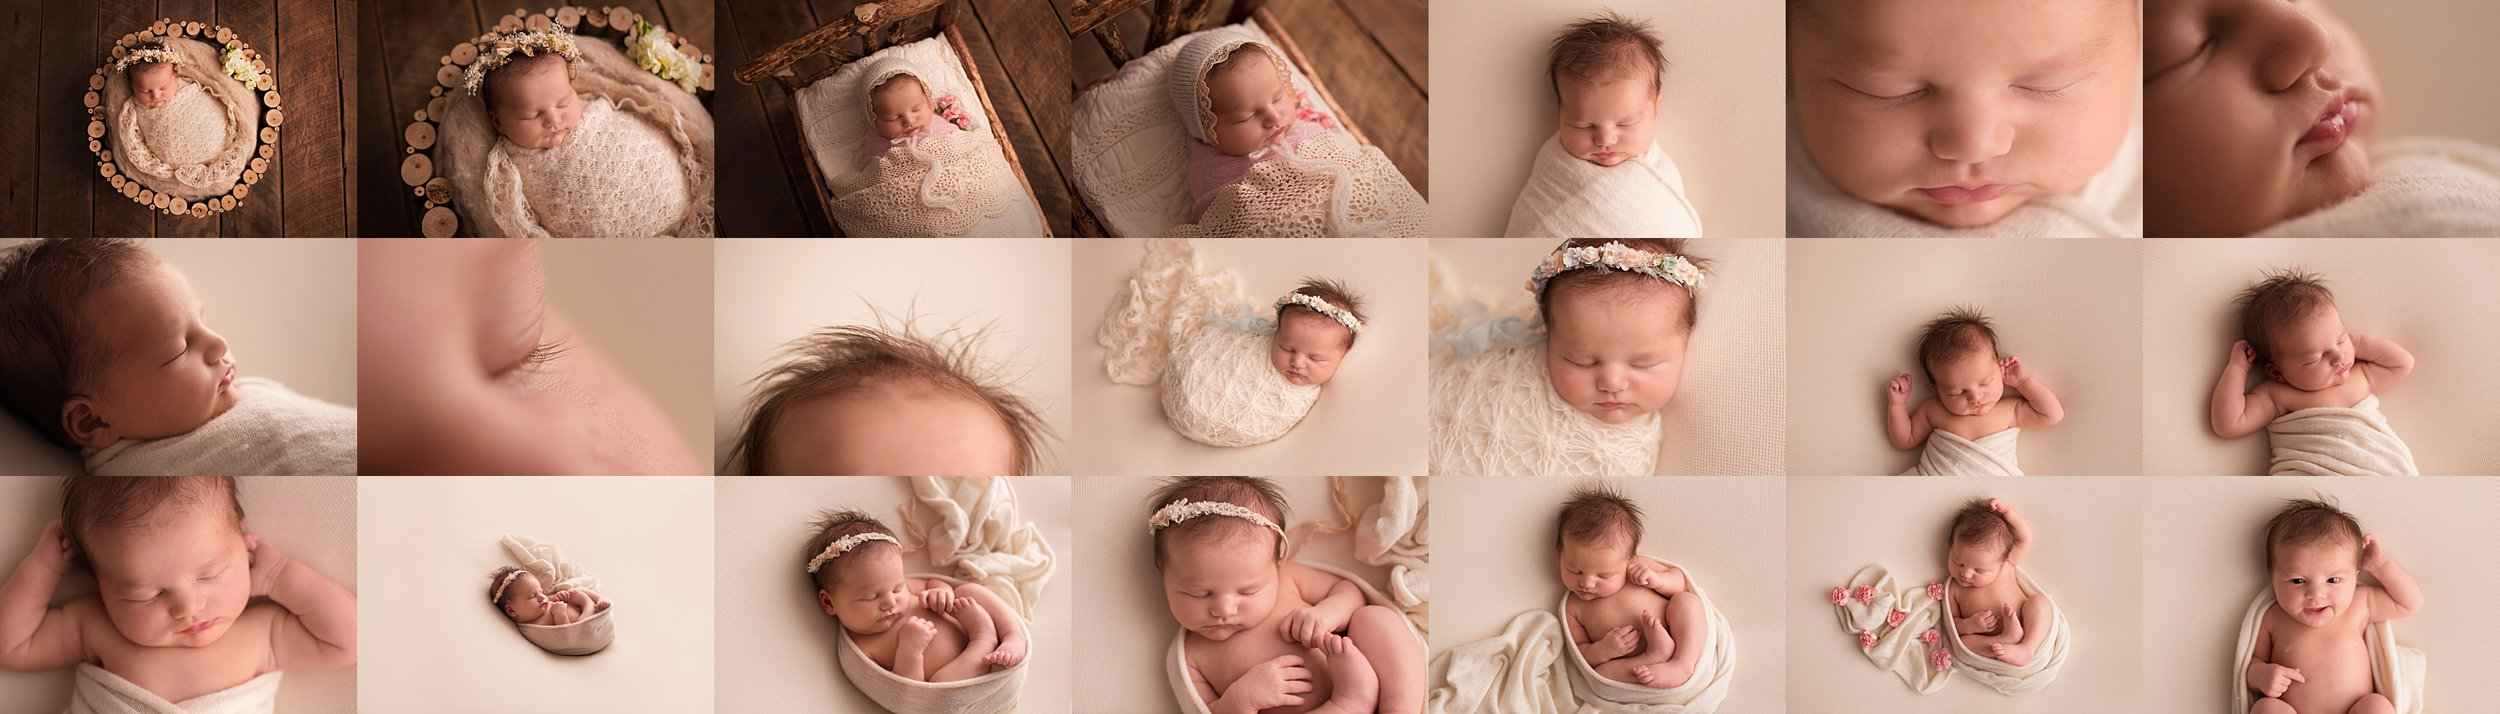 Sneak peak of the resulting images from my Stress-Free Sleepy Baby Workflow.